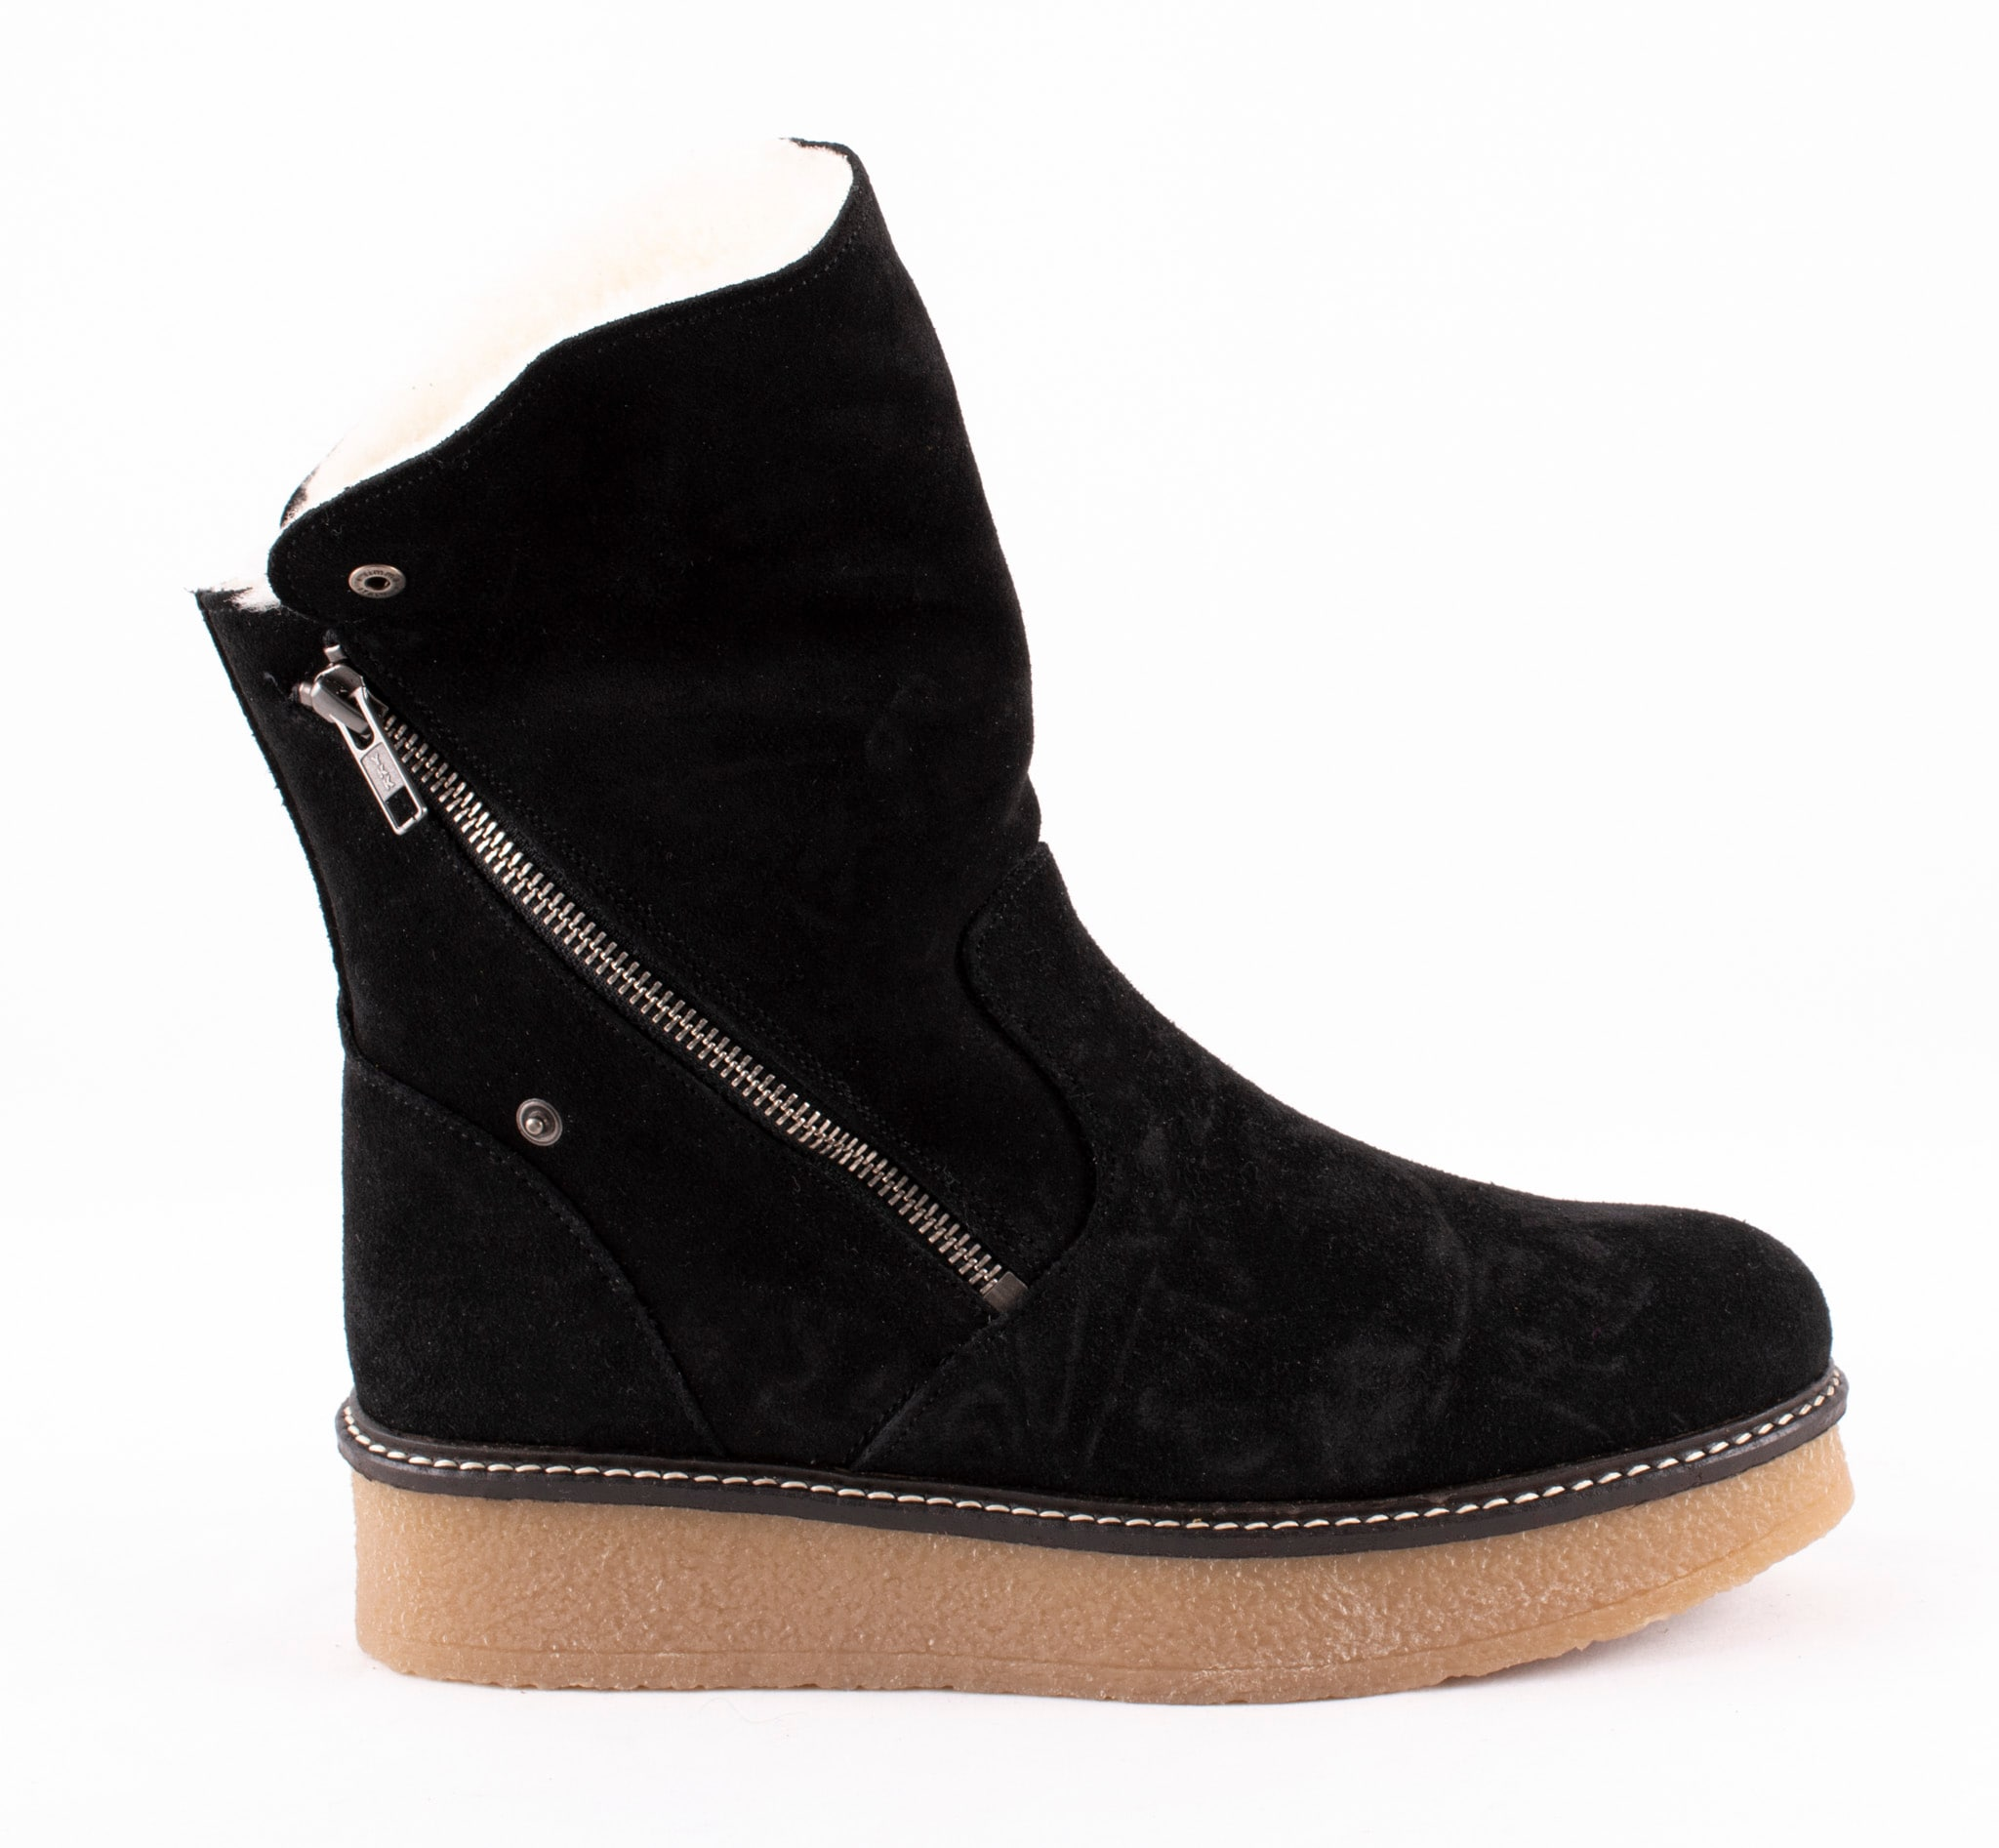 Karita seude boots